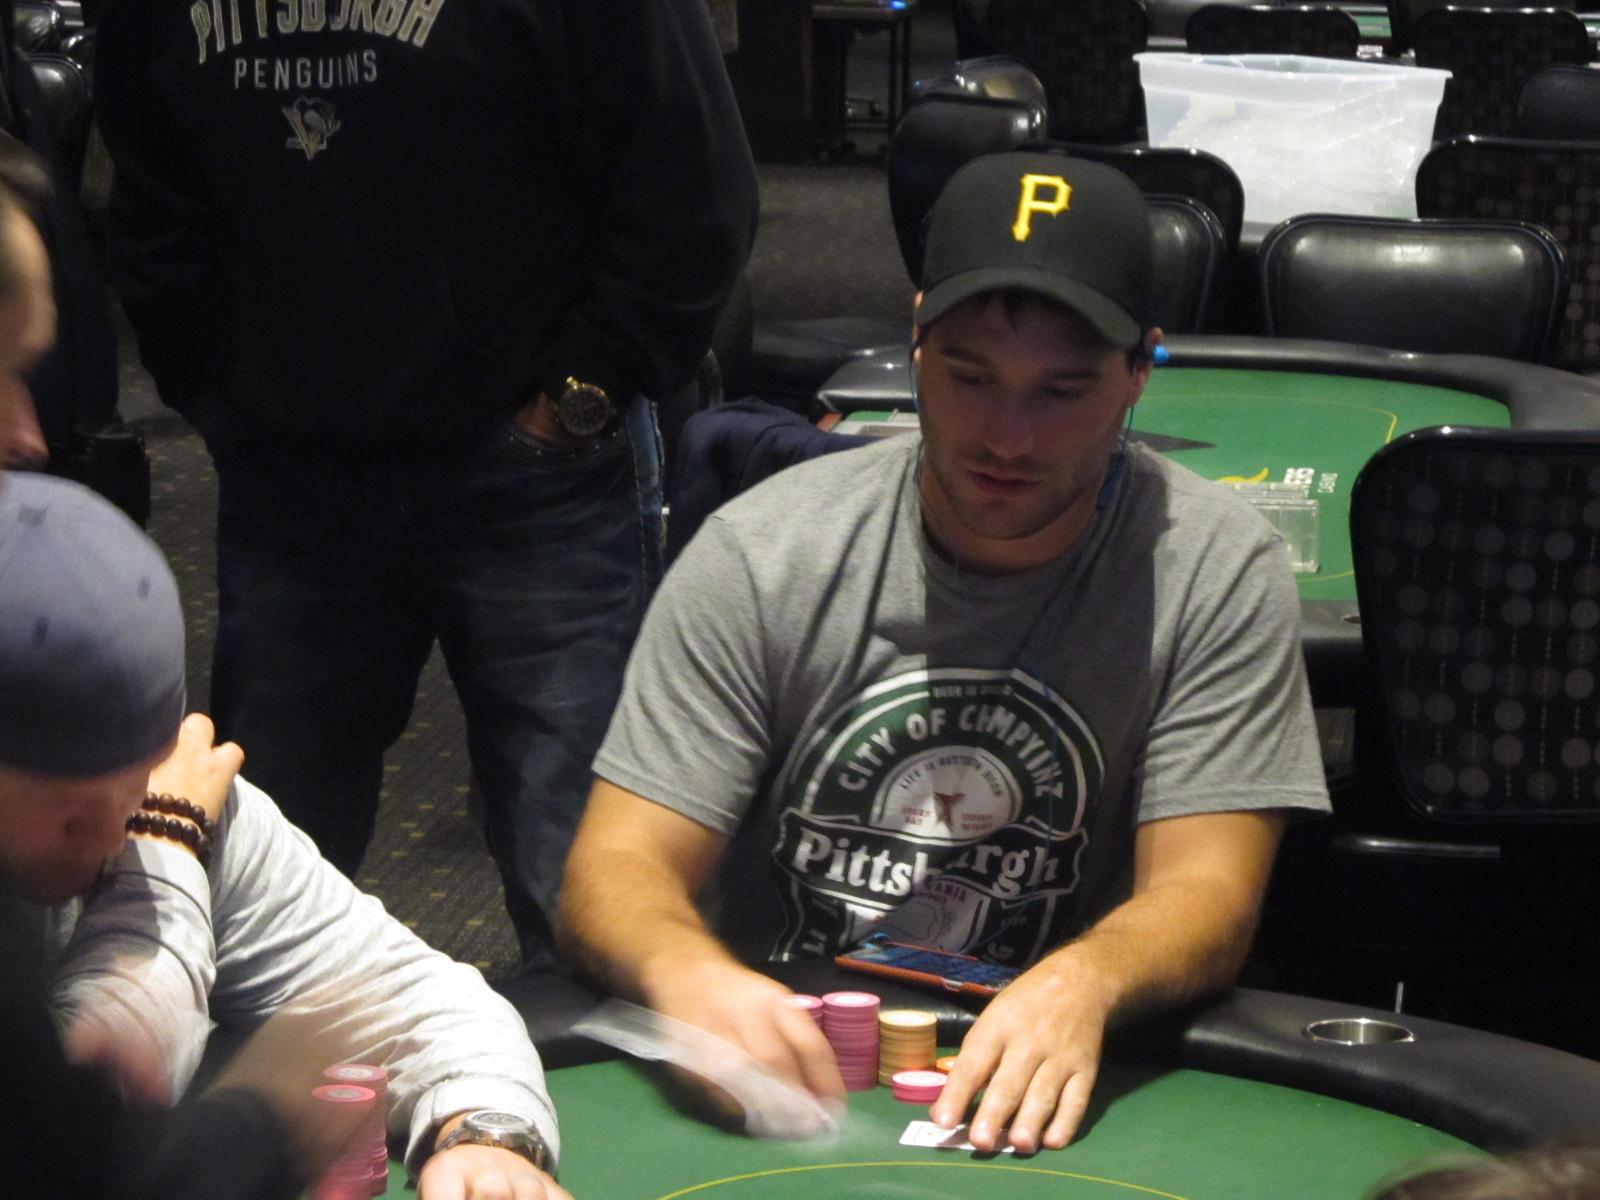 Pittsburgh hammer poker tournament poker tournaments calgary 2017